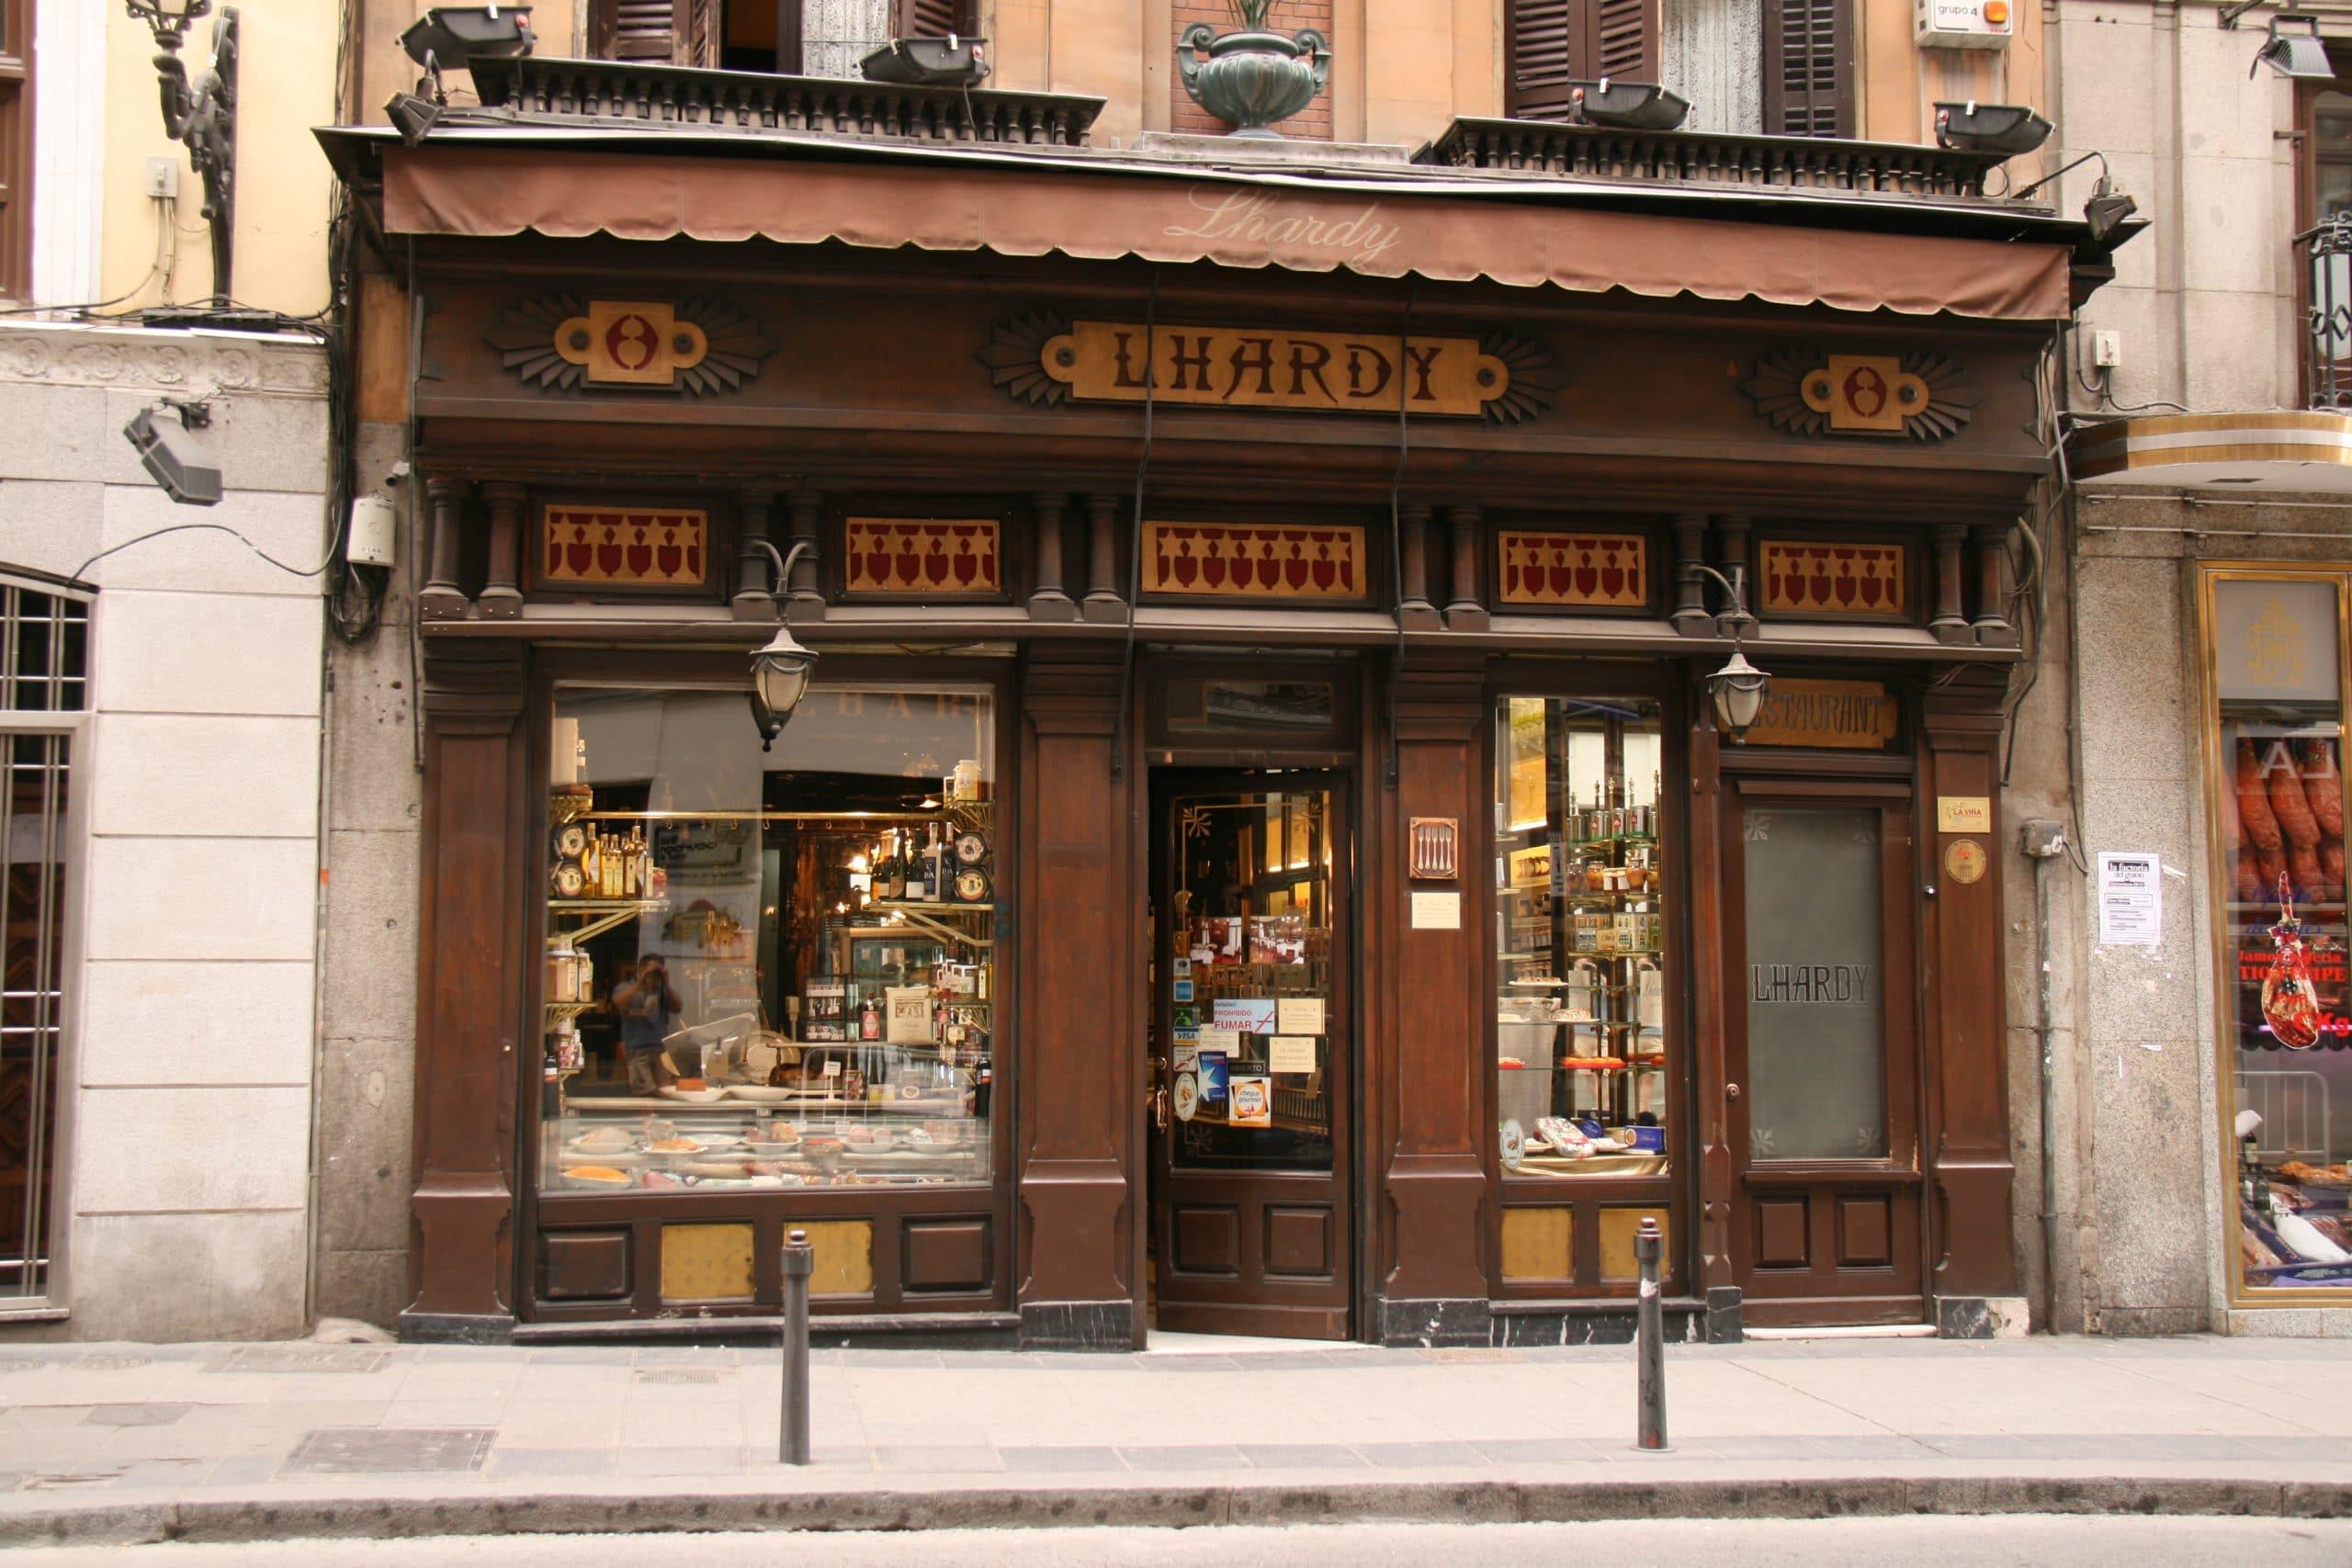 Restaurante Casa Lhardy, Madrid